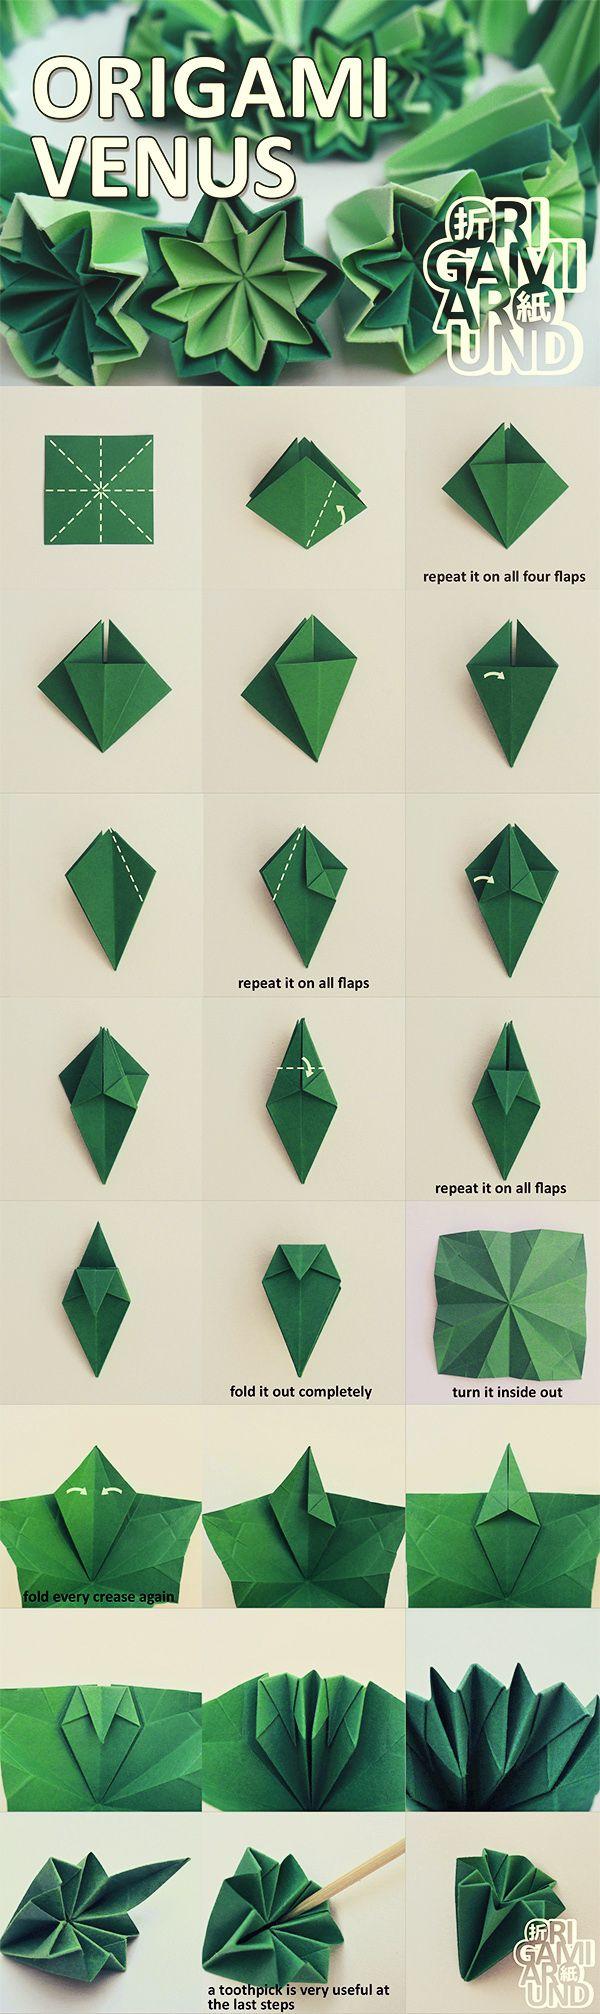 How to make an origami kusudama cactus part I. - folding the venus unit